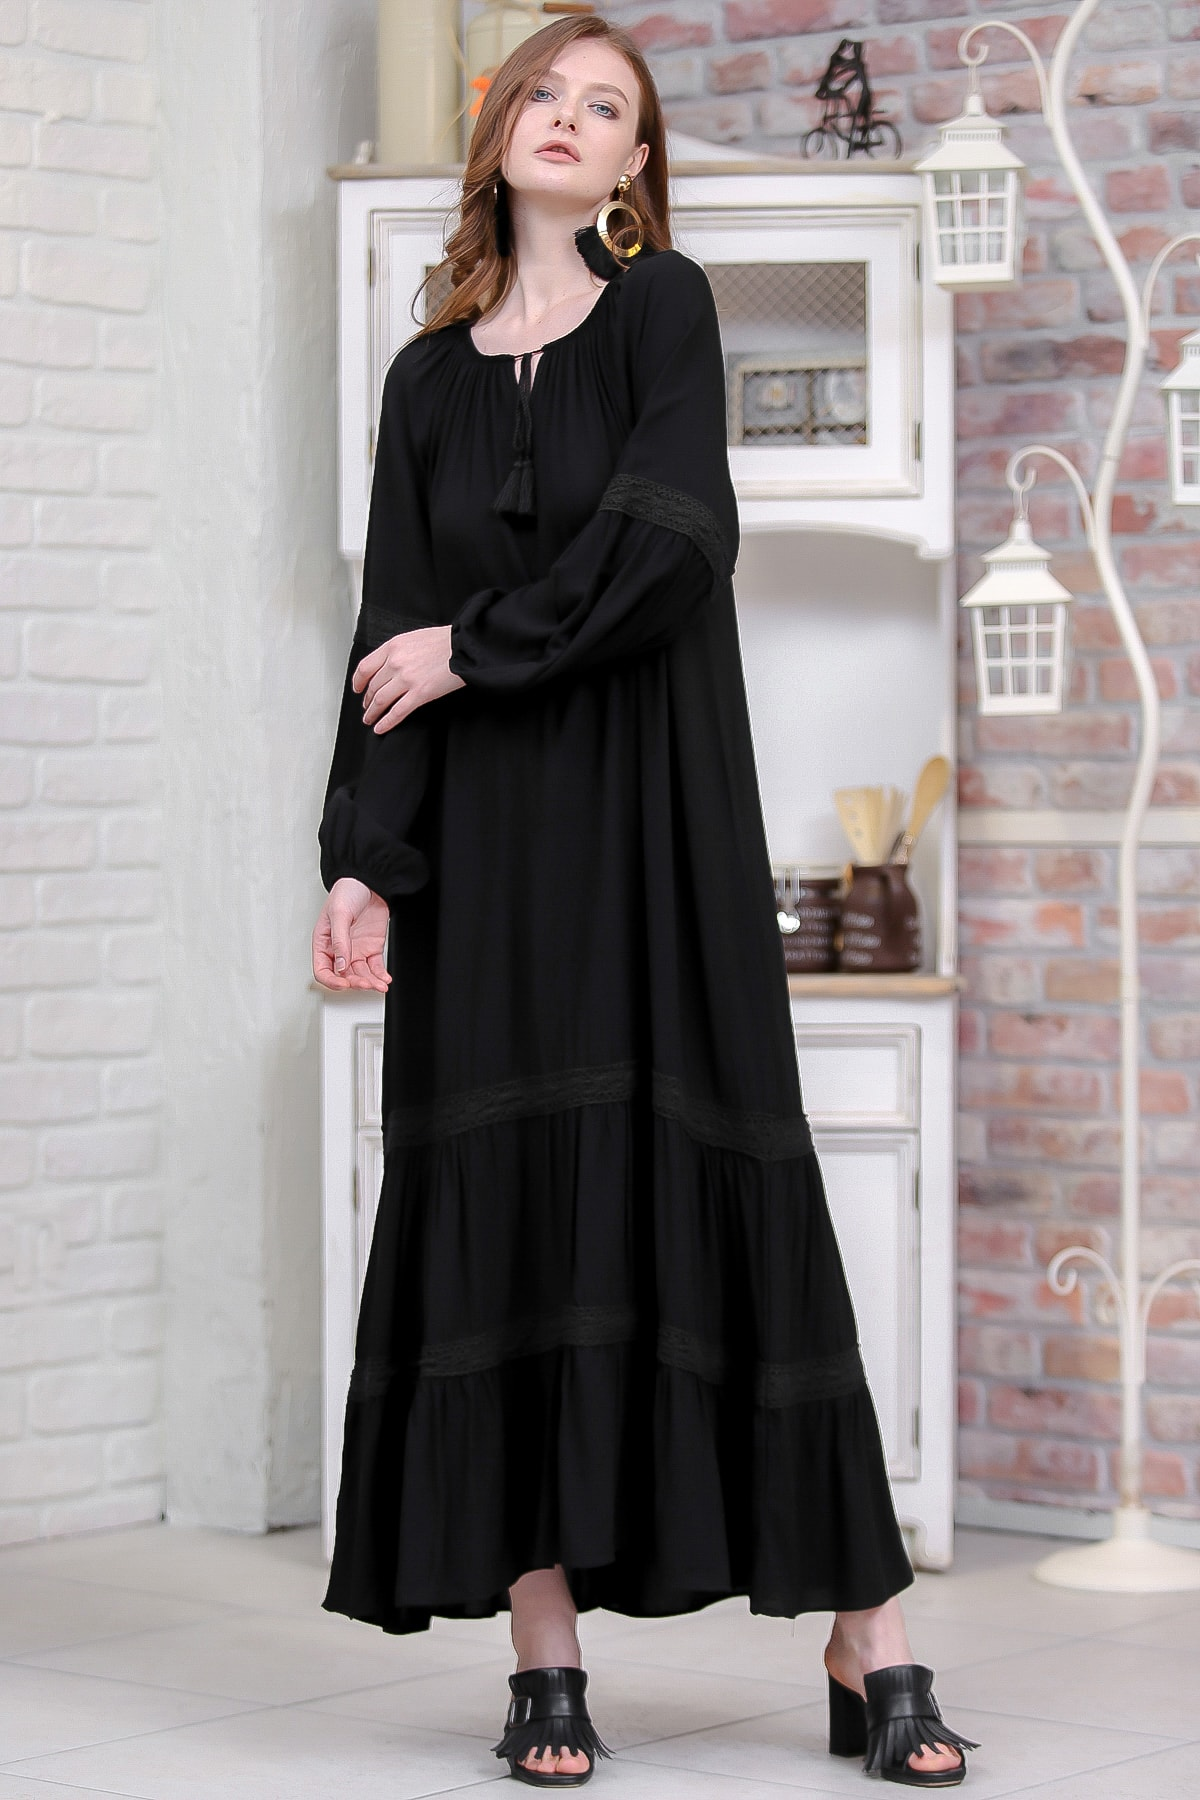 Kadın Siyah Bohem Kopanaki Detaylı Salaş Dokuma Elbise  M10160000EL97314